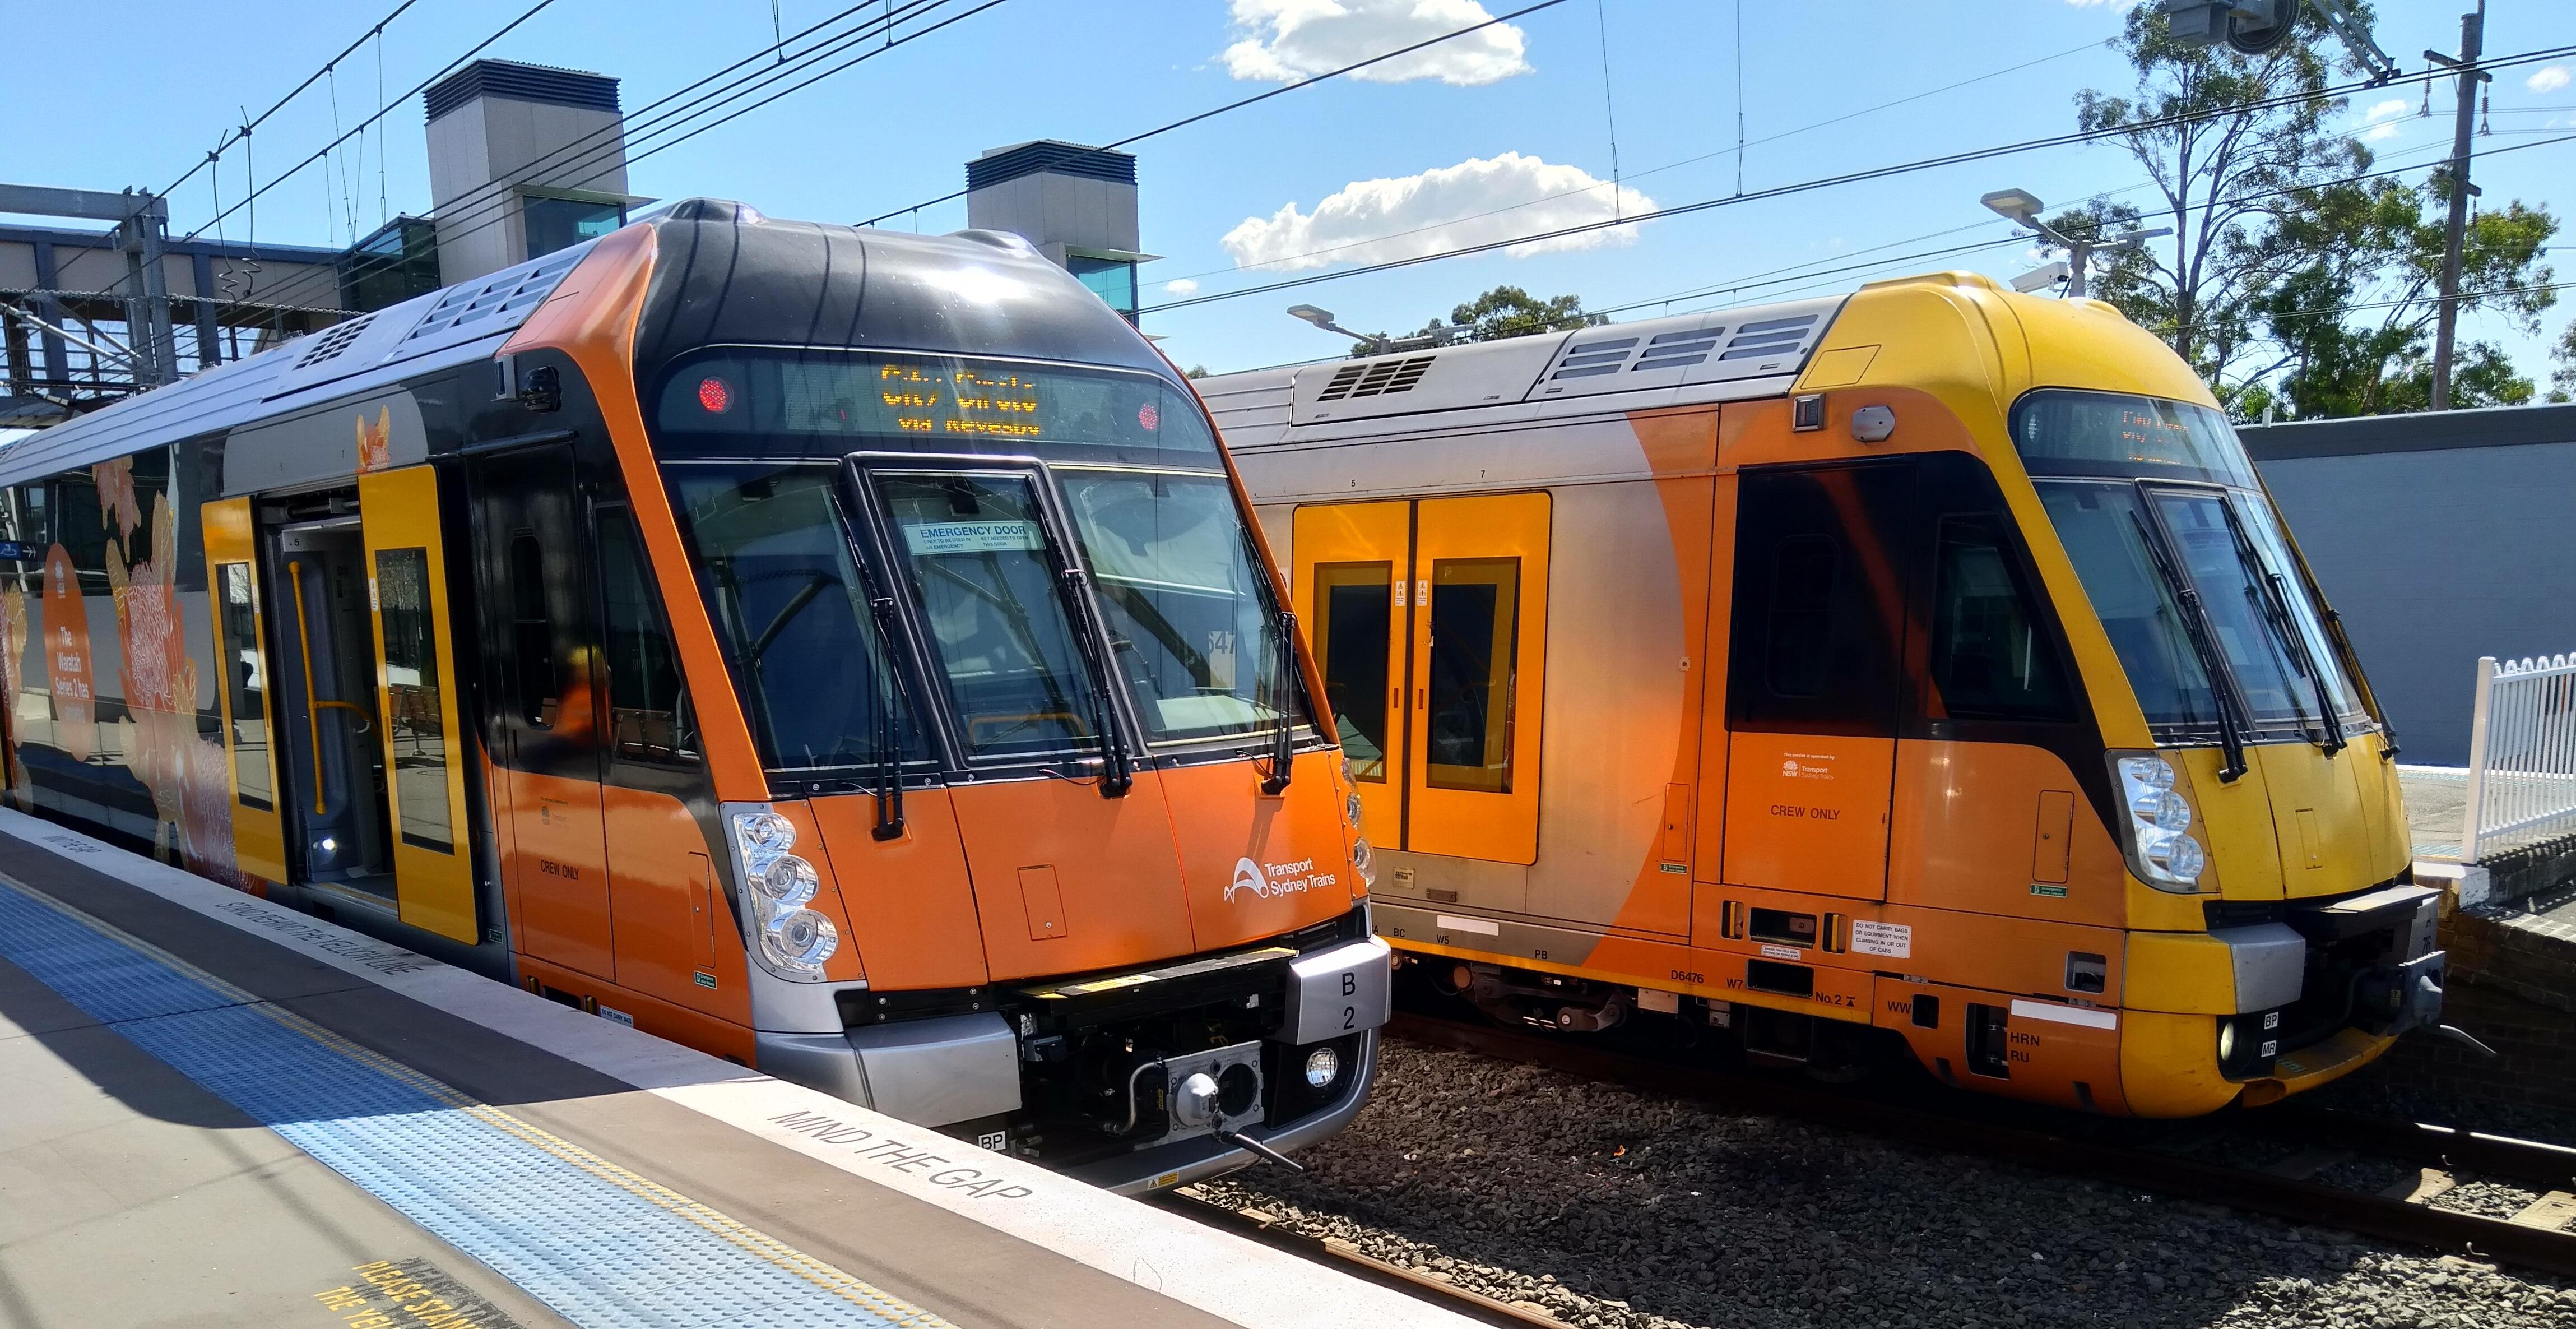 Sydney Trains A & B sets - Wikipedia